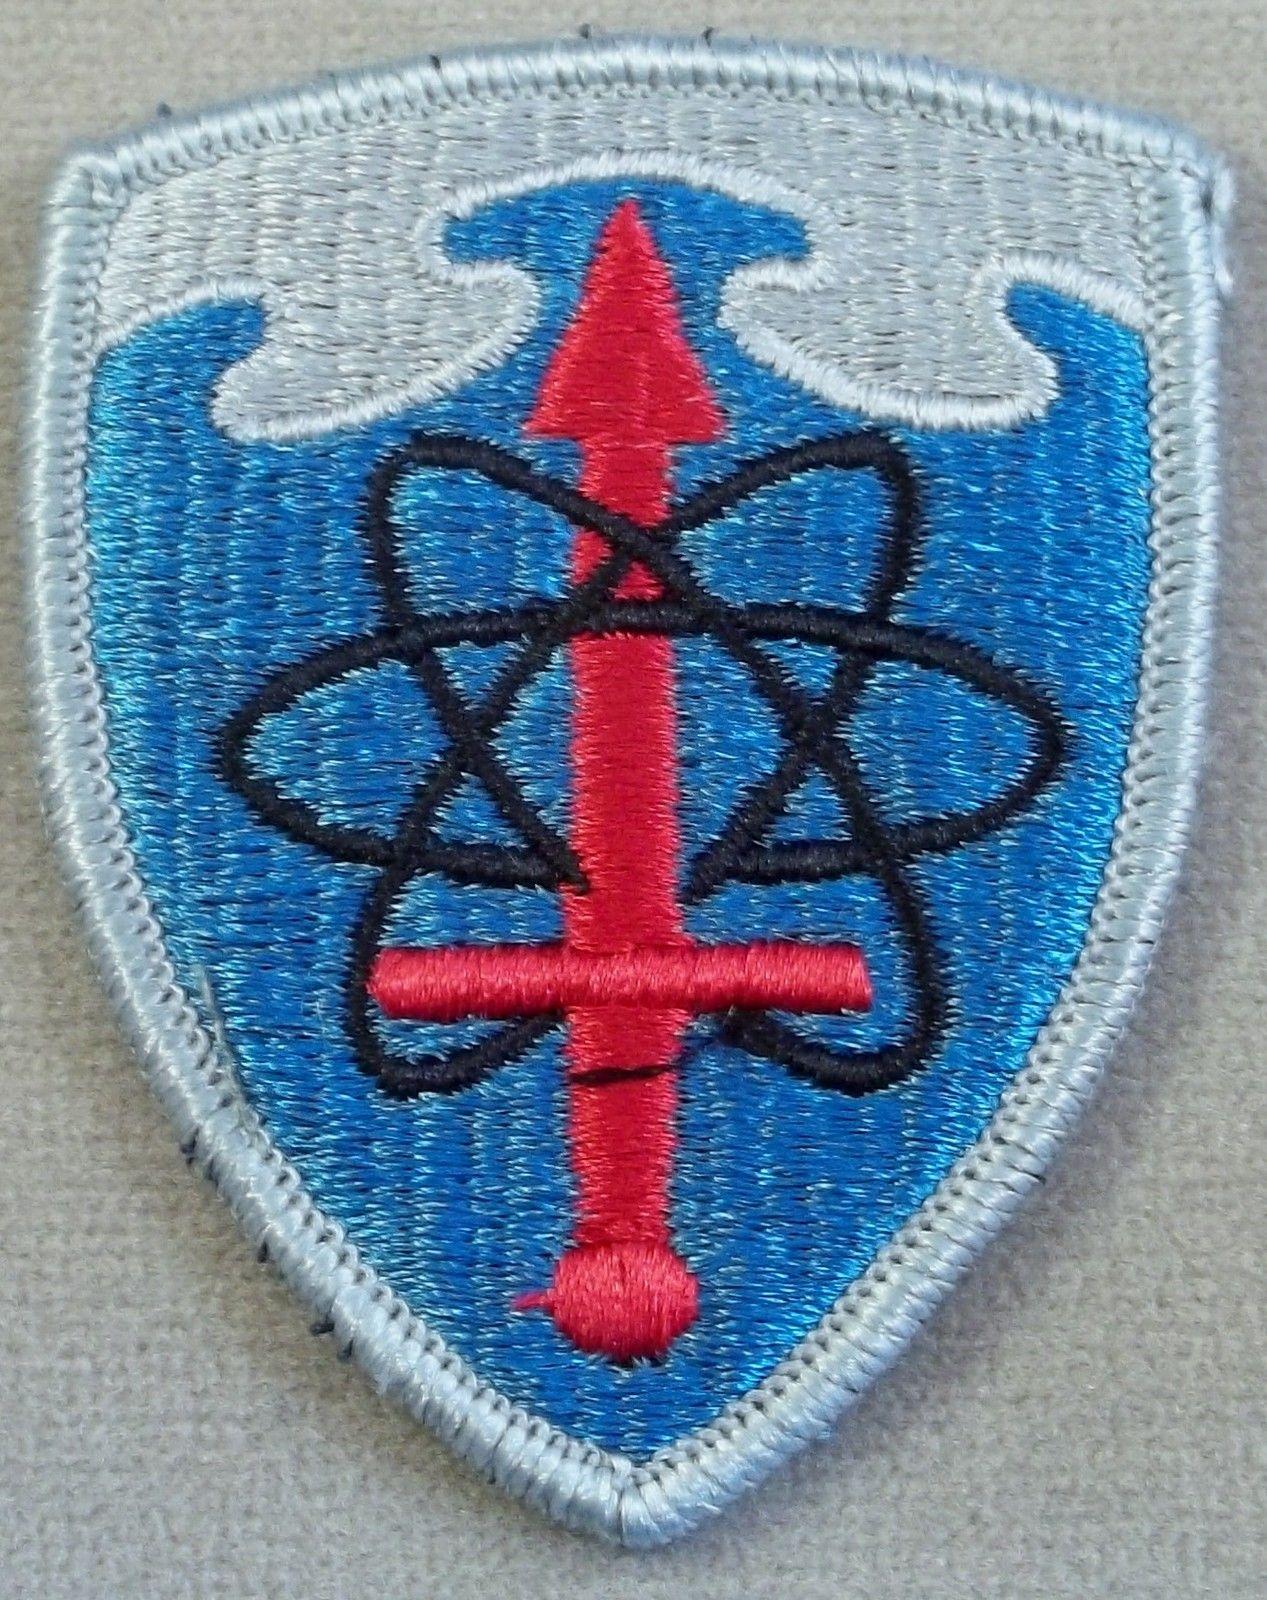 Army Patch type 2 Intelligence Agency merrowed edge